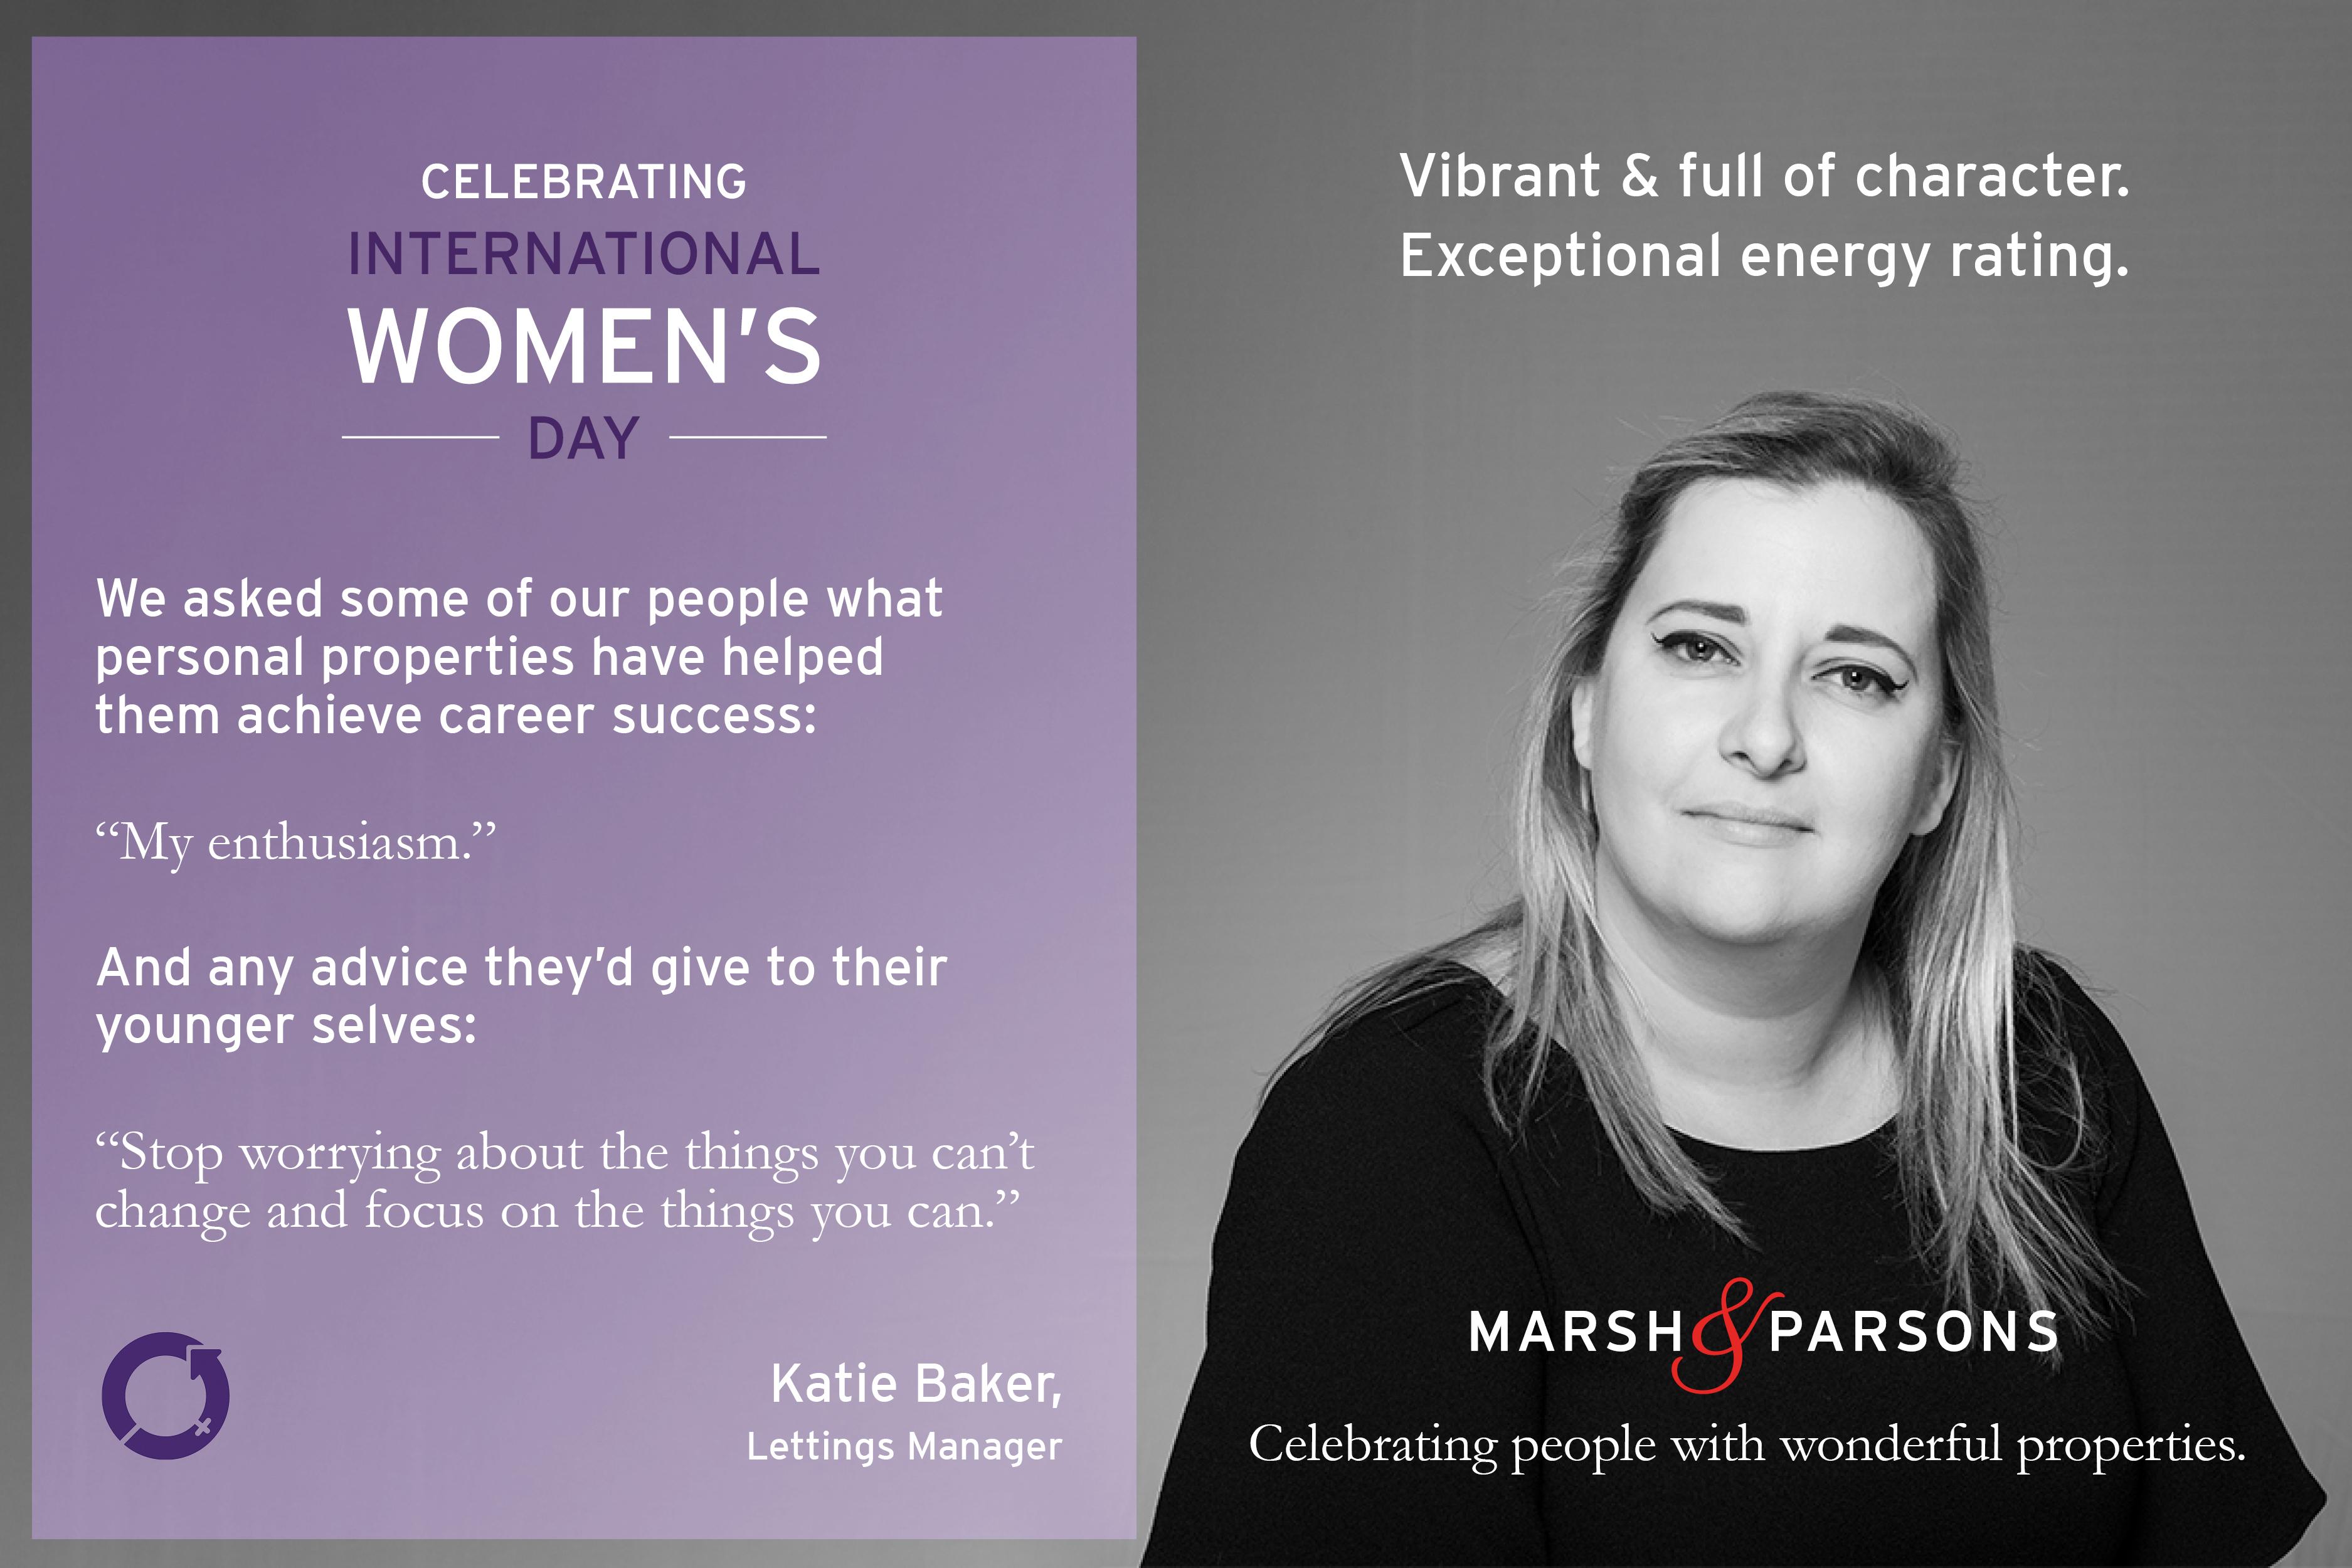 Katie Baker, International Women's Day